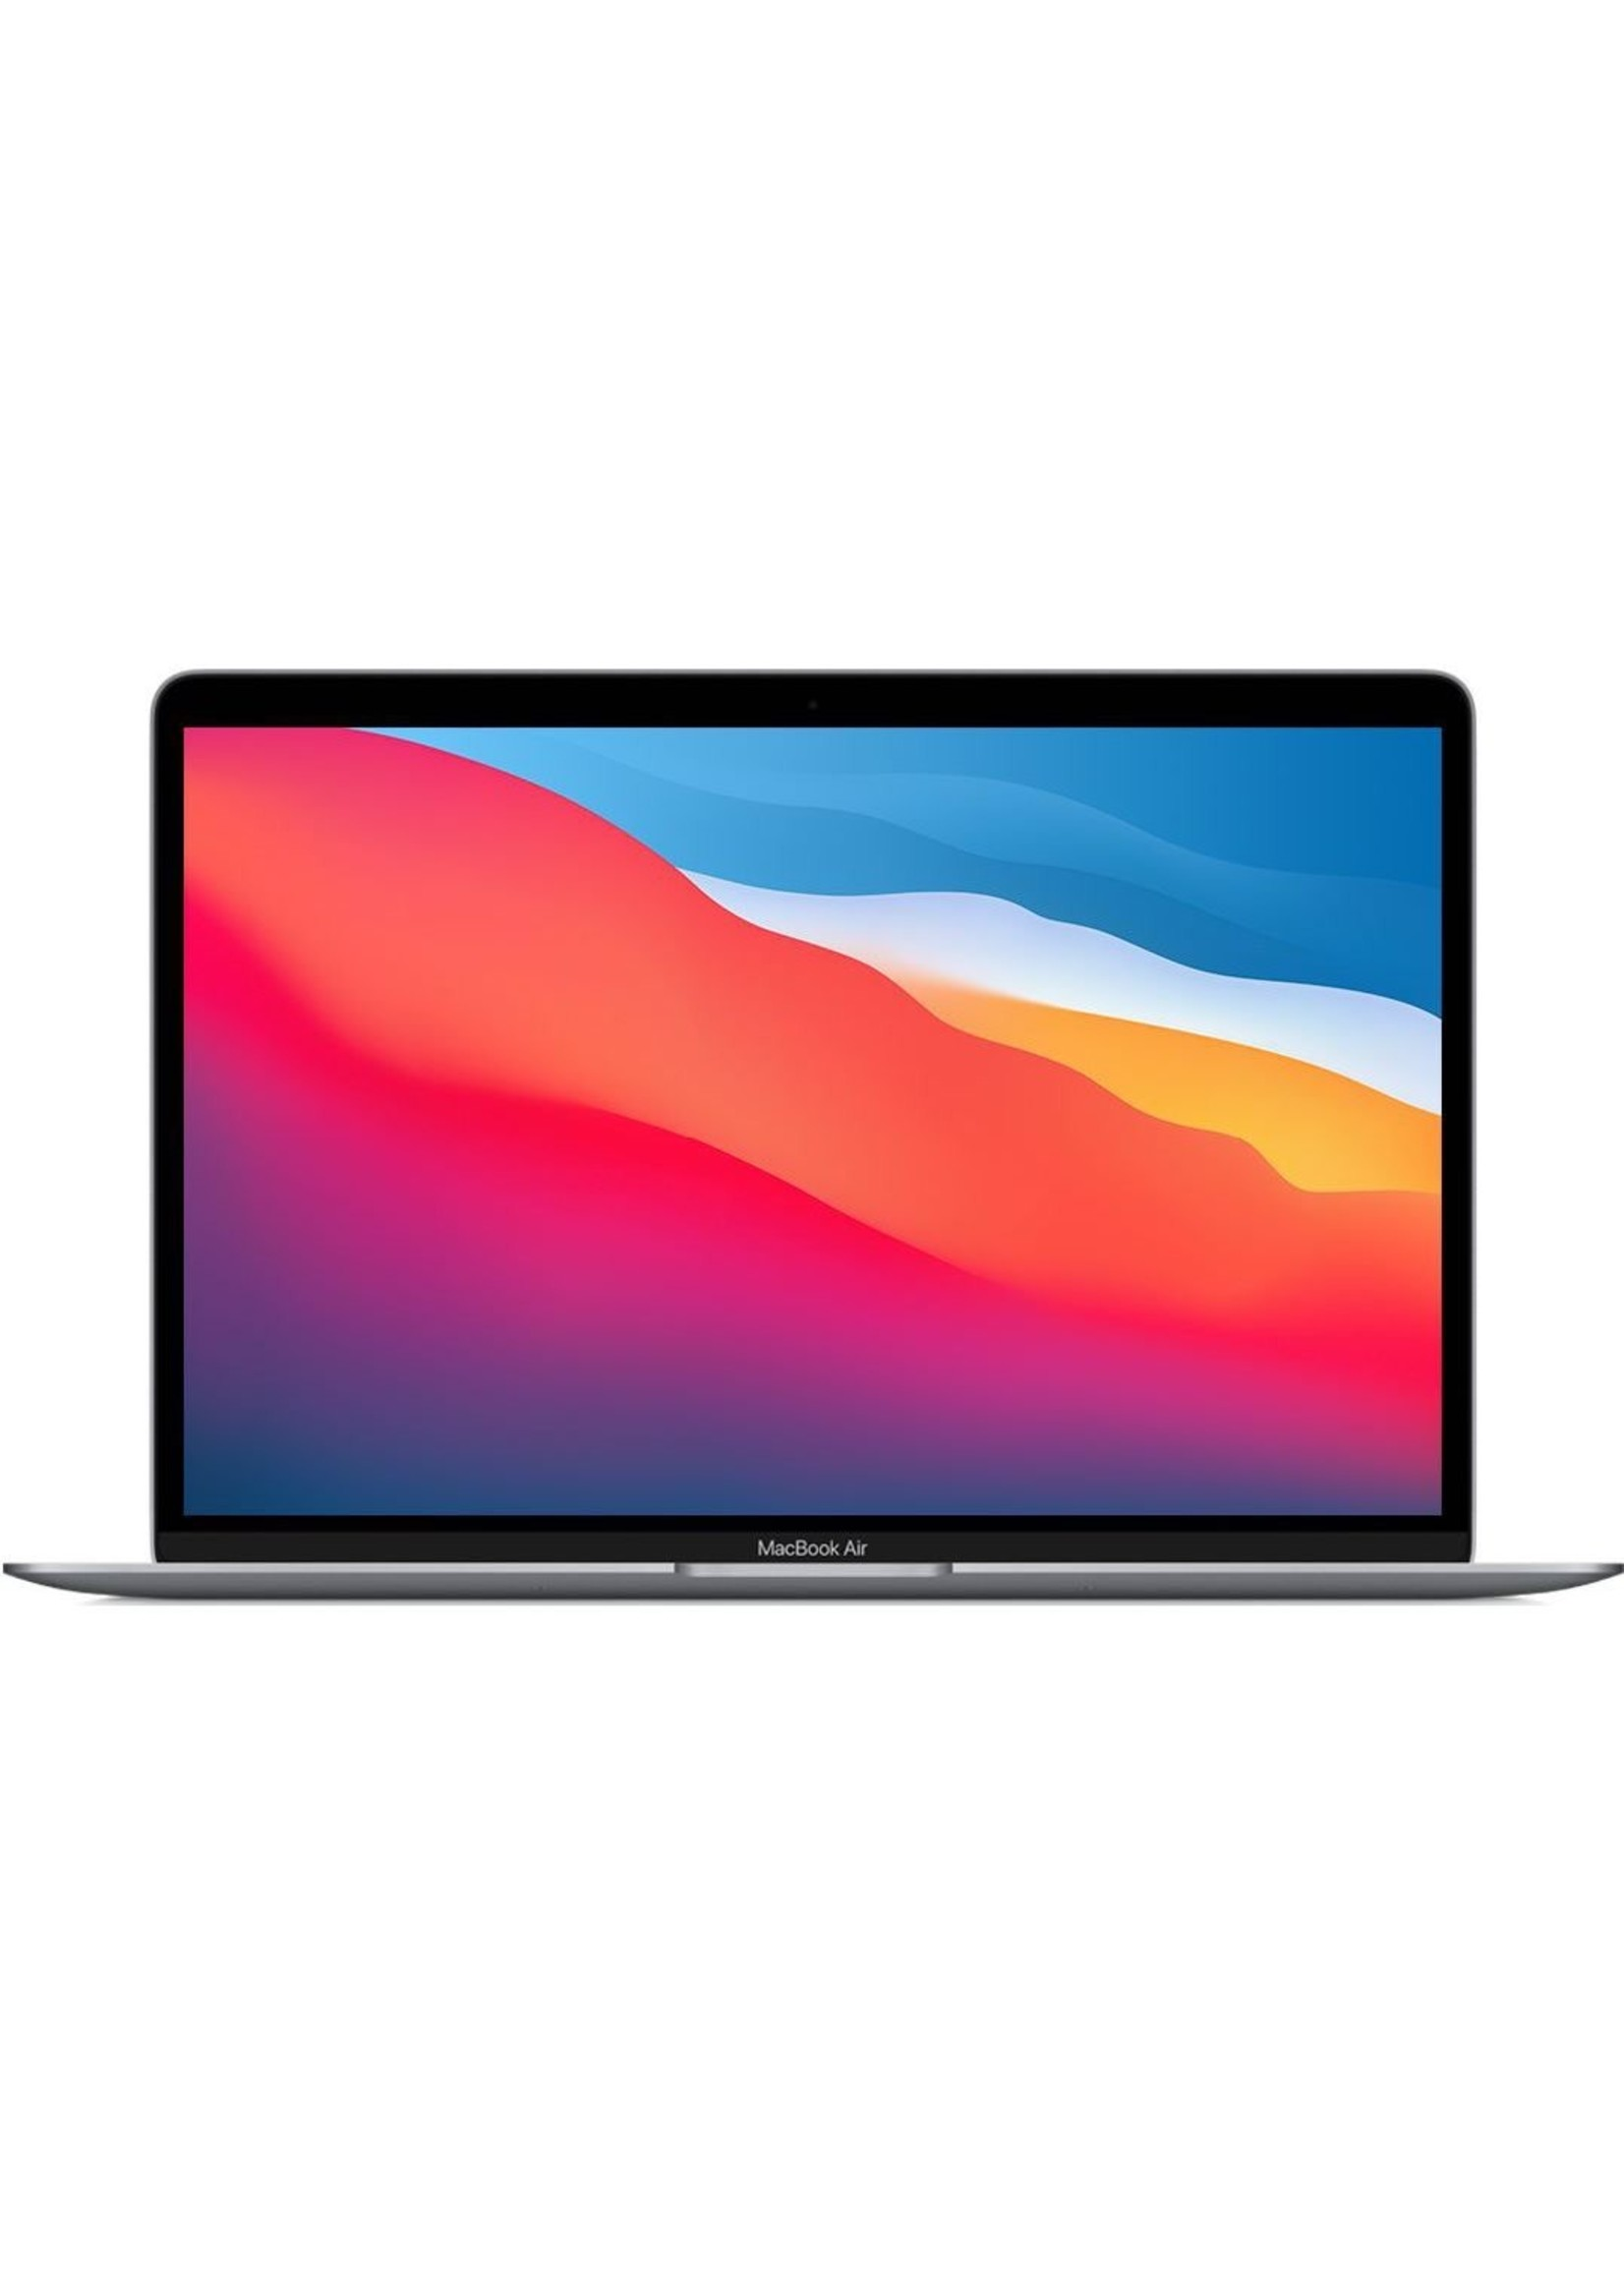 Apple MacBook Air 13-inch 512GB Space Gray